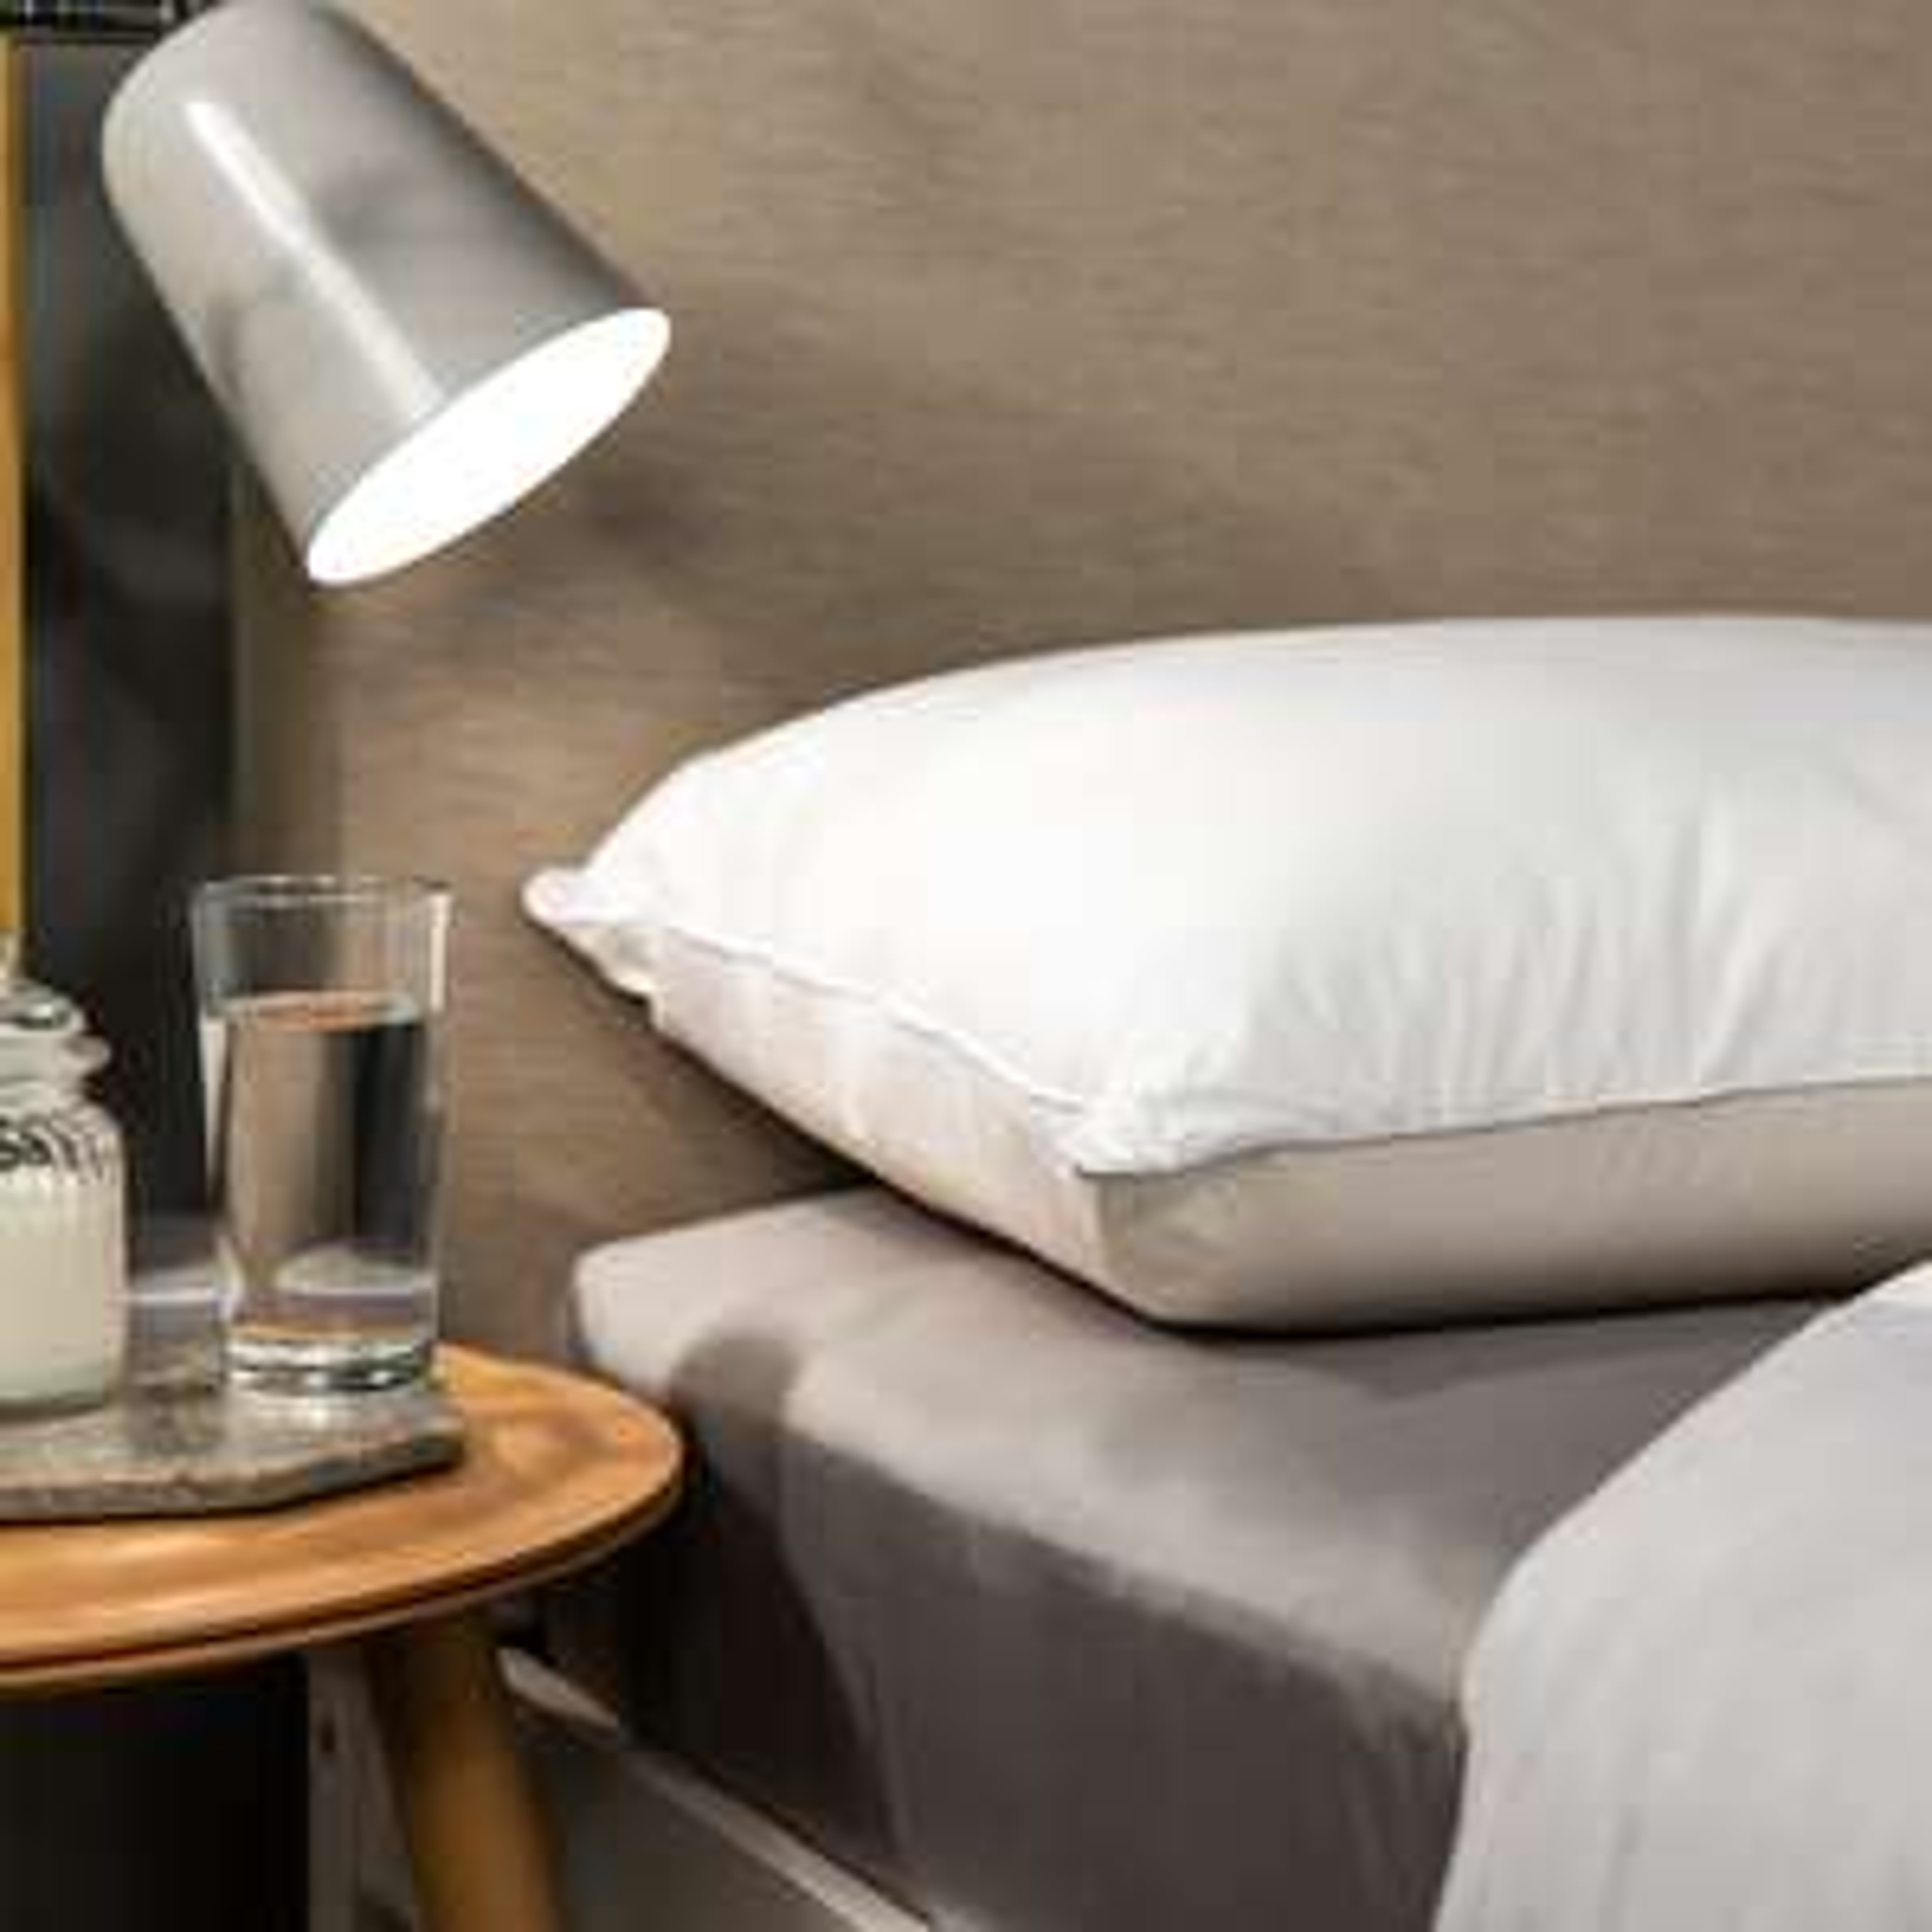 Snuggledown Clean & Protect Pillow BOGOF for £12.29 delivered @ Sleepseeker